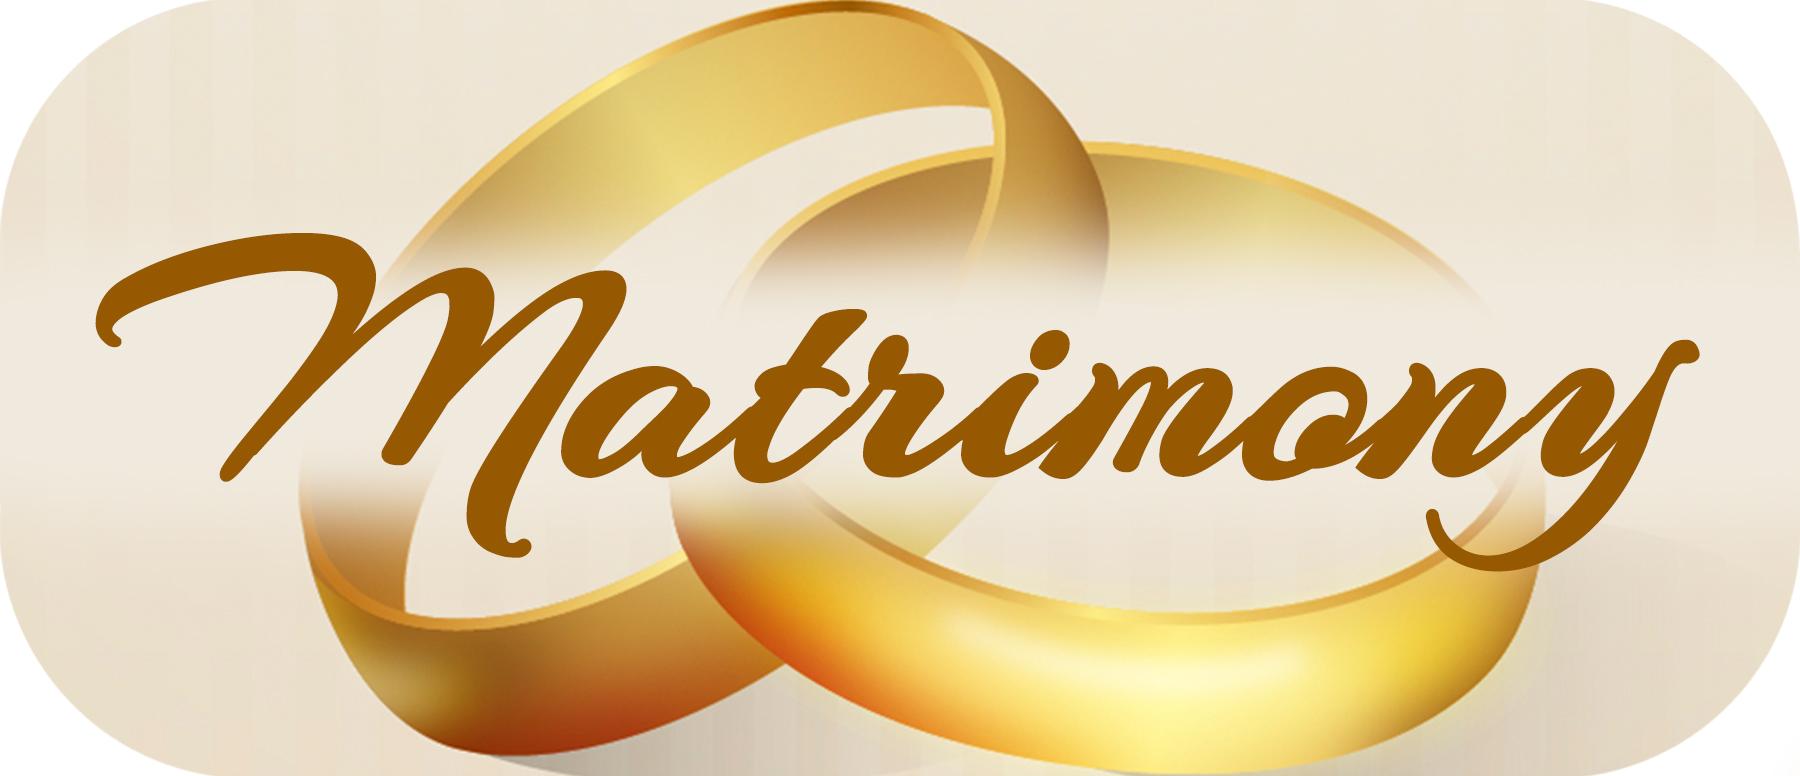 matrimony-button.jpg